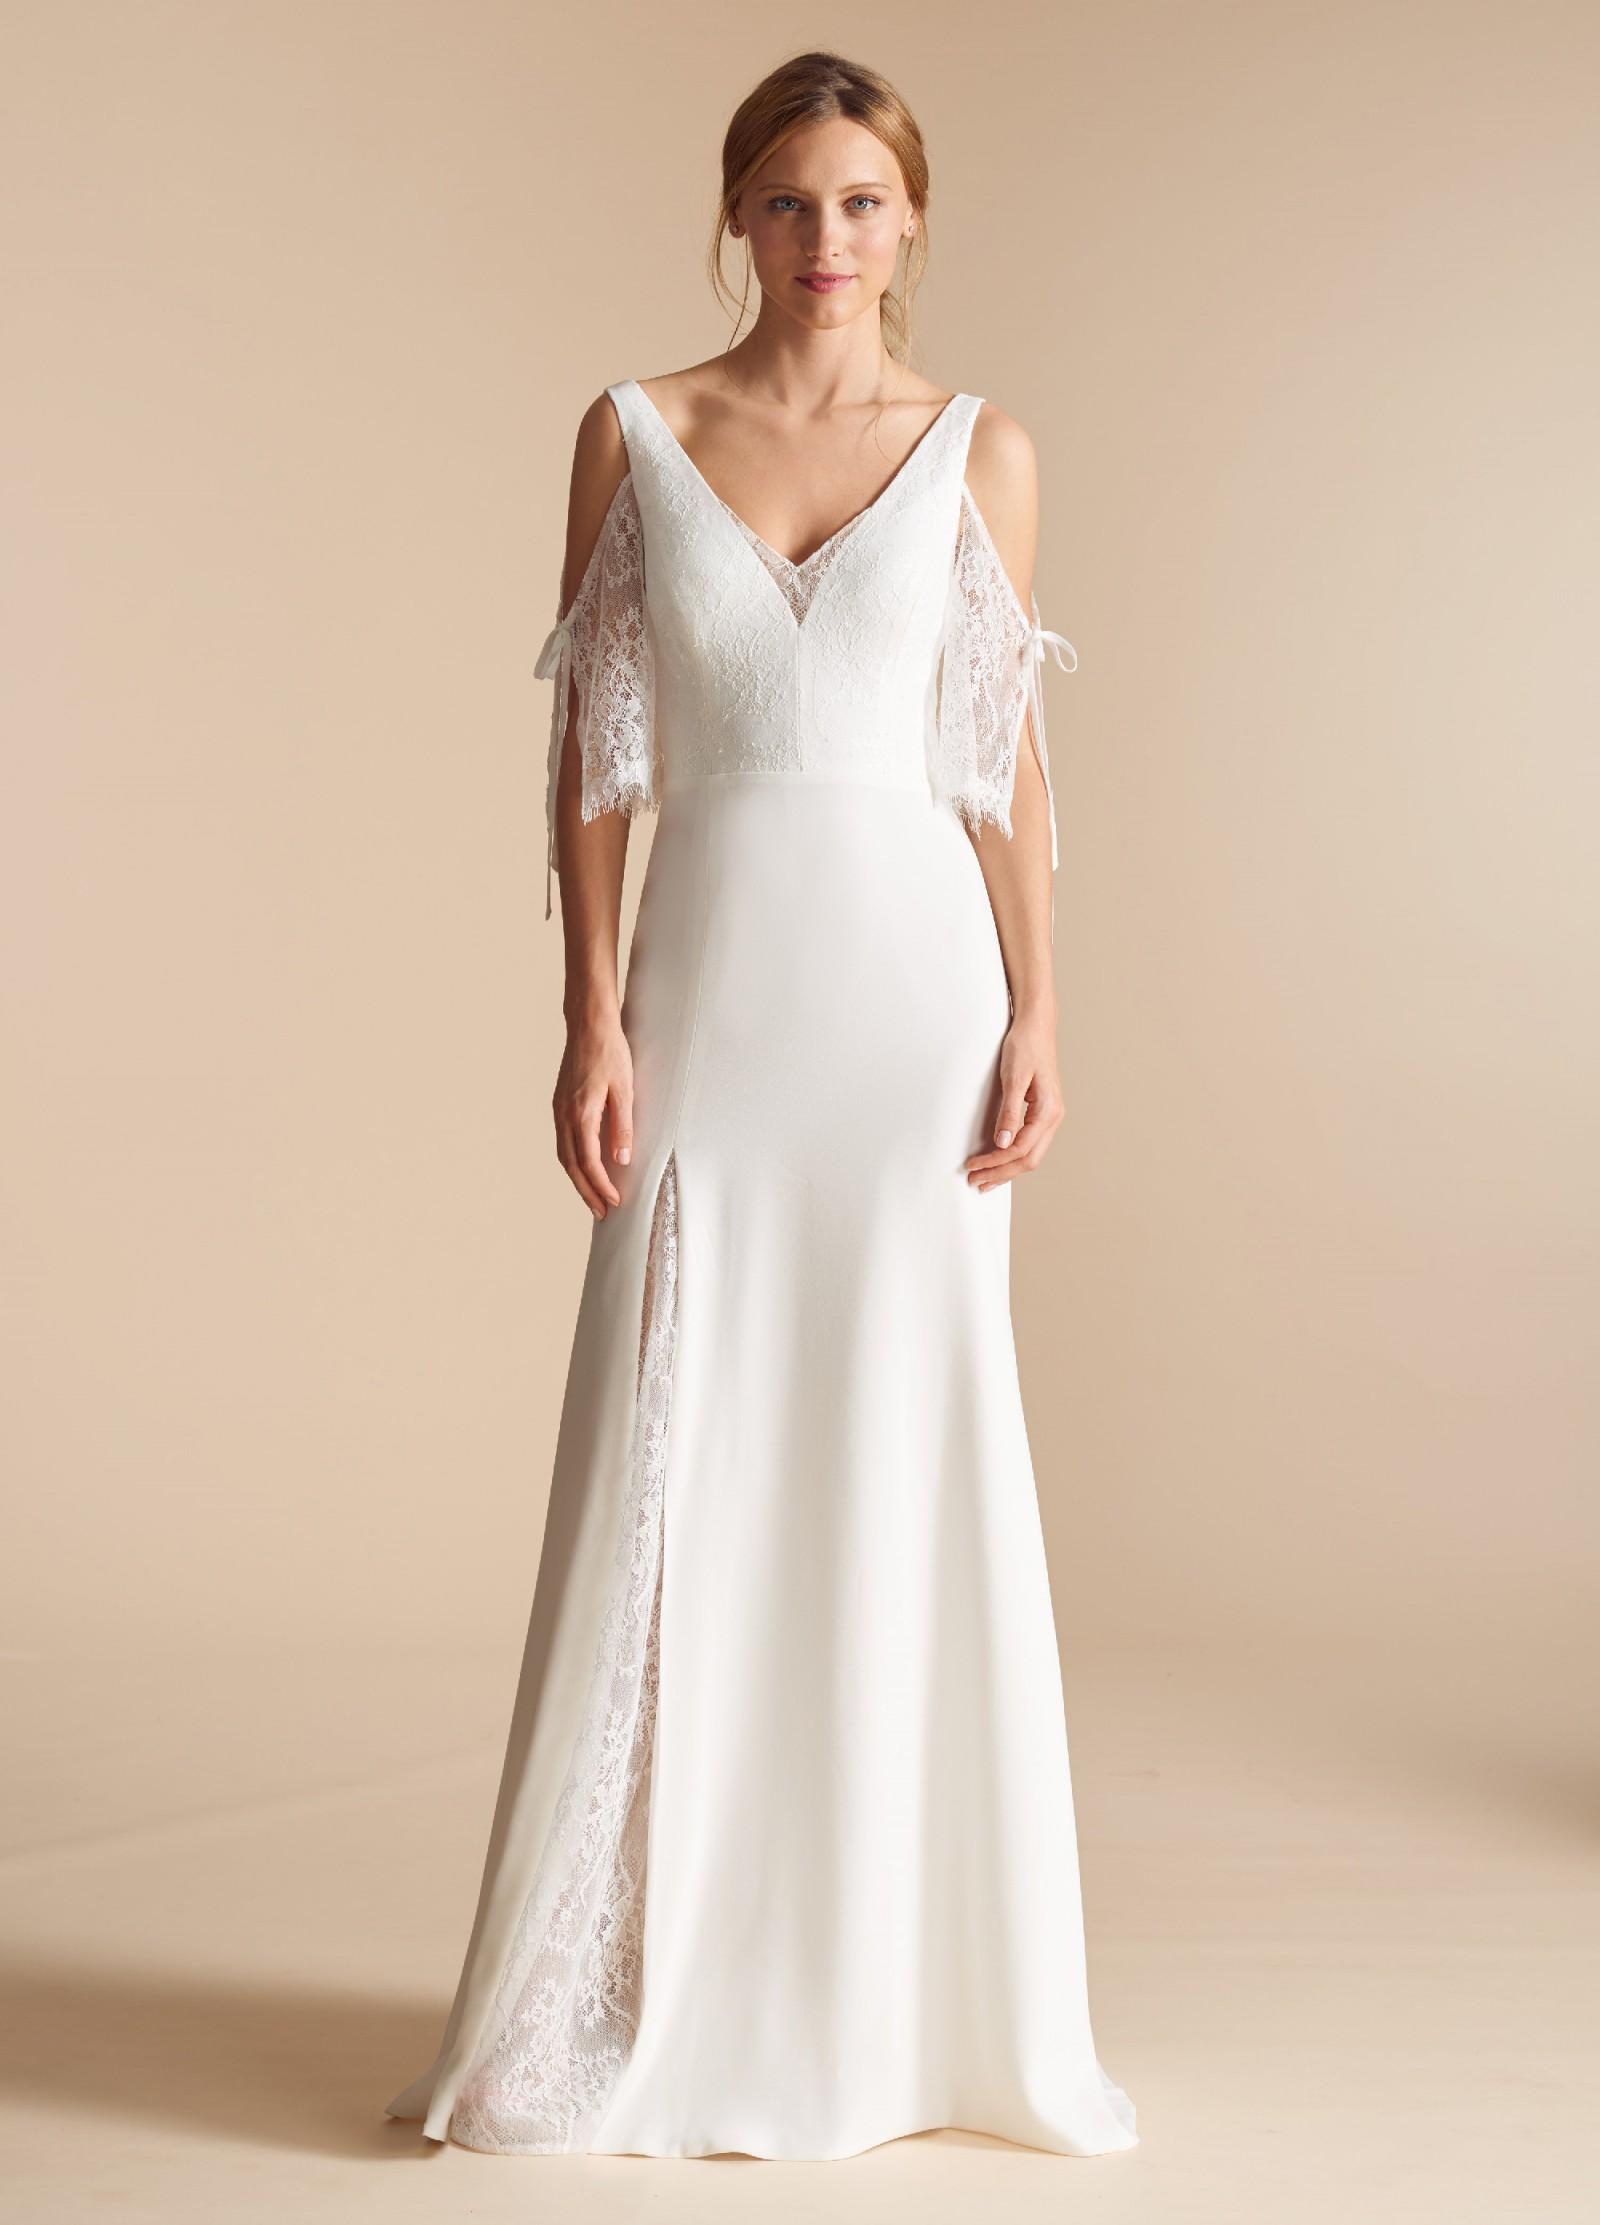 Ti Adora 7807 Jules Sample Wedding Dress on Sale 56% Off – Stillwhite